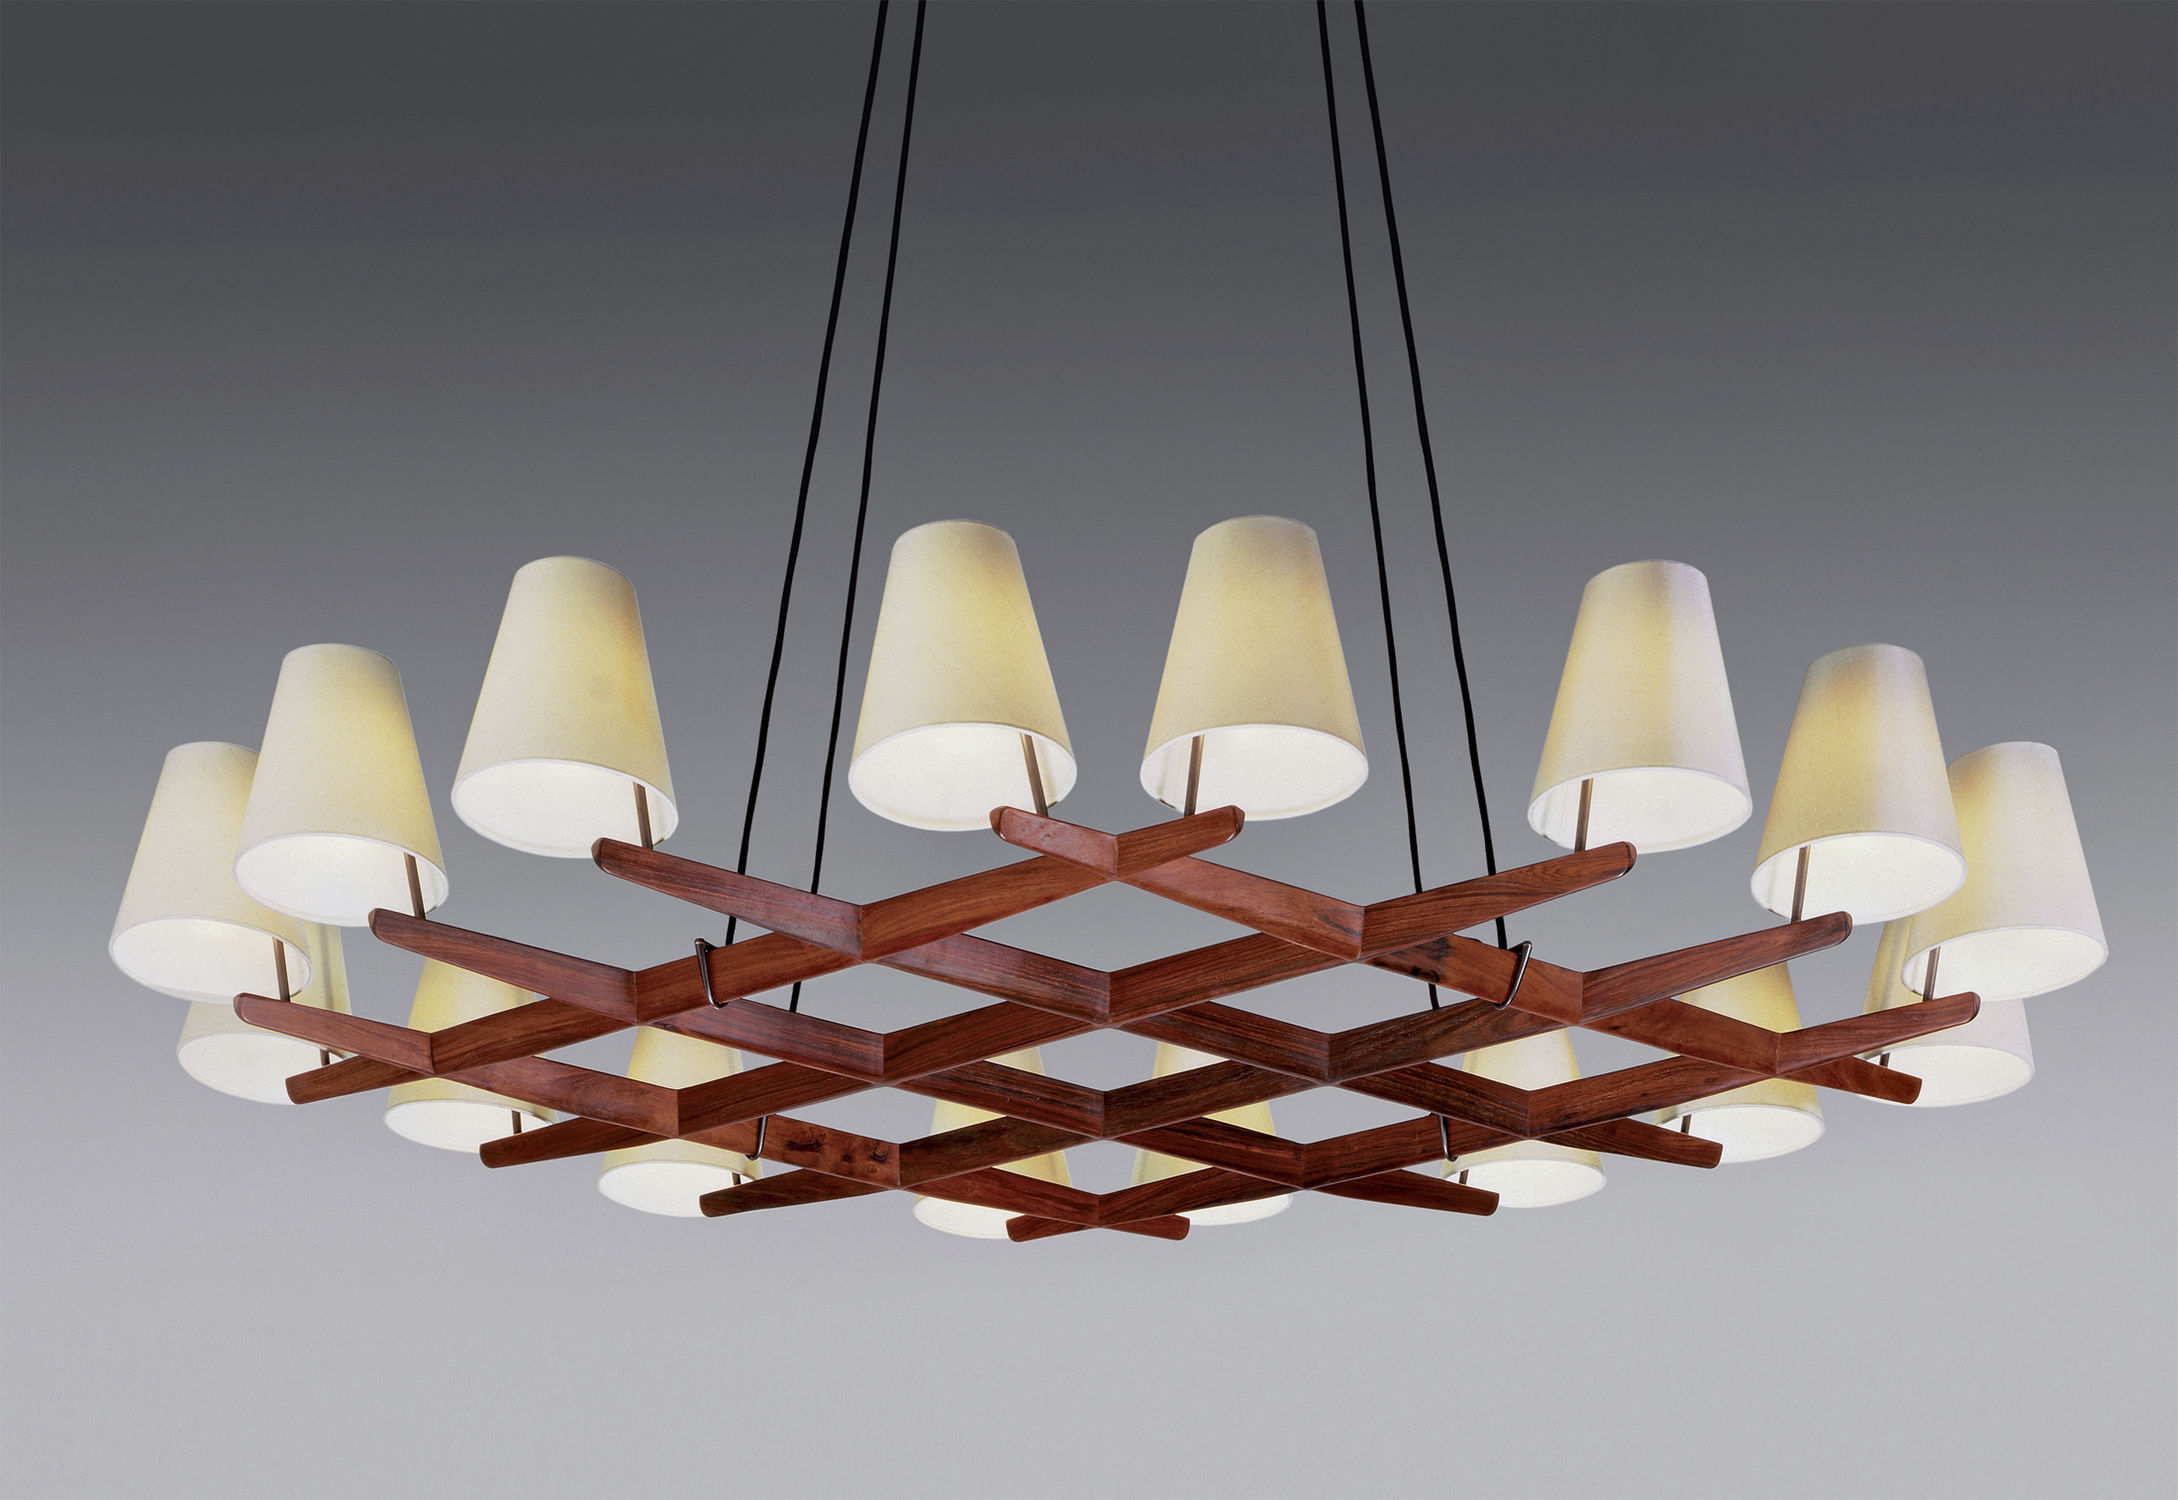 Lampadario In Legno Design : Lampadario in legno etsy